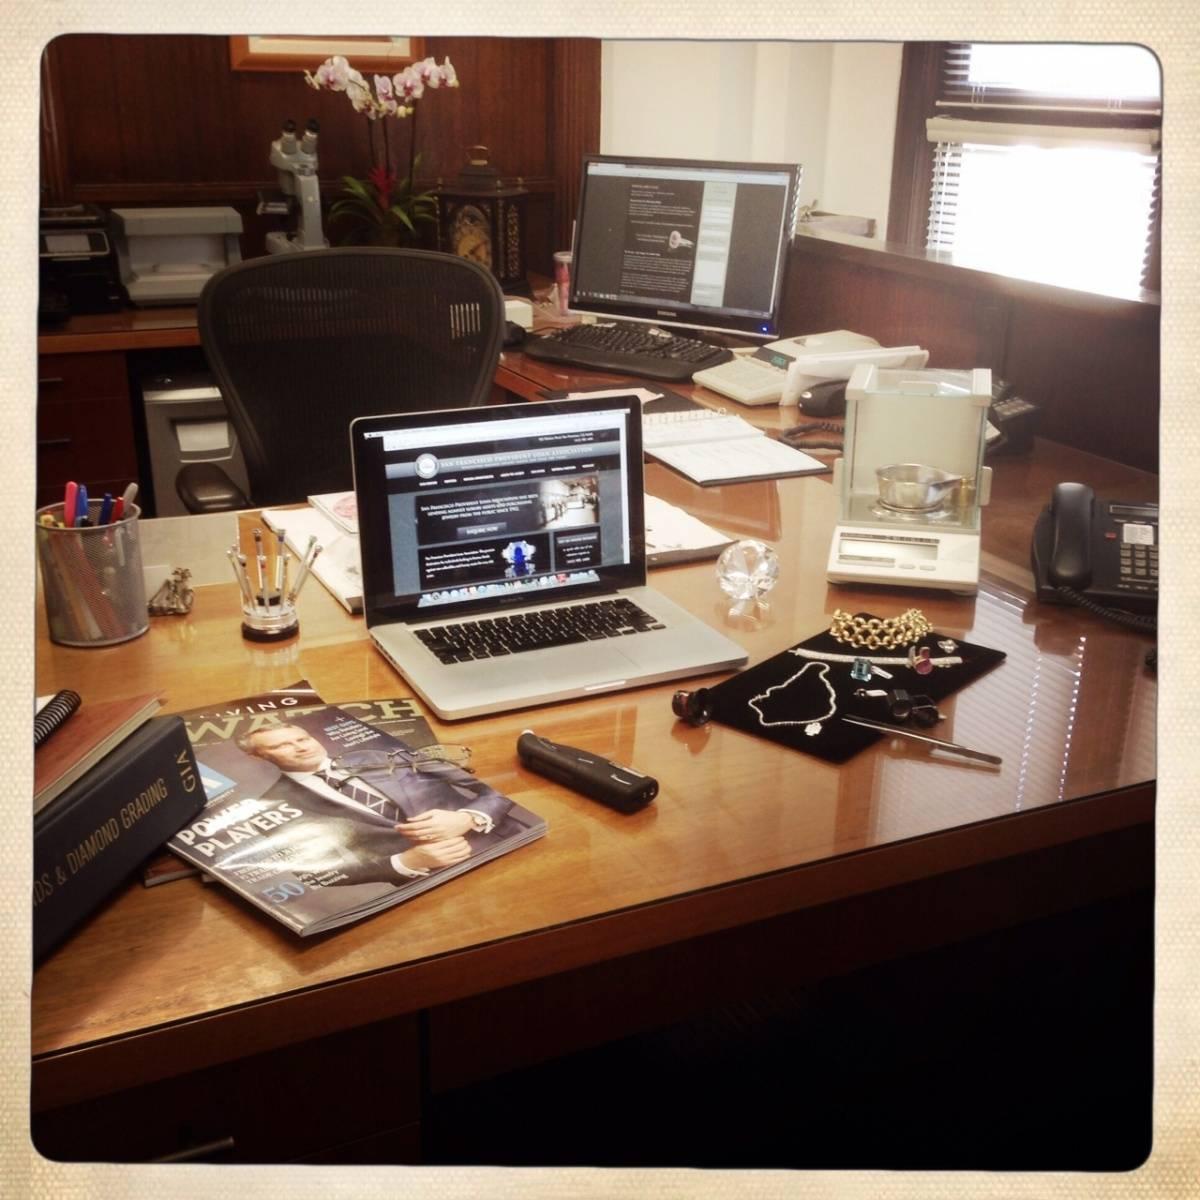 Joseph and Marcus Chait's desk